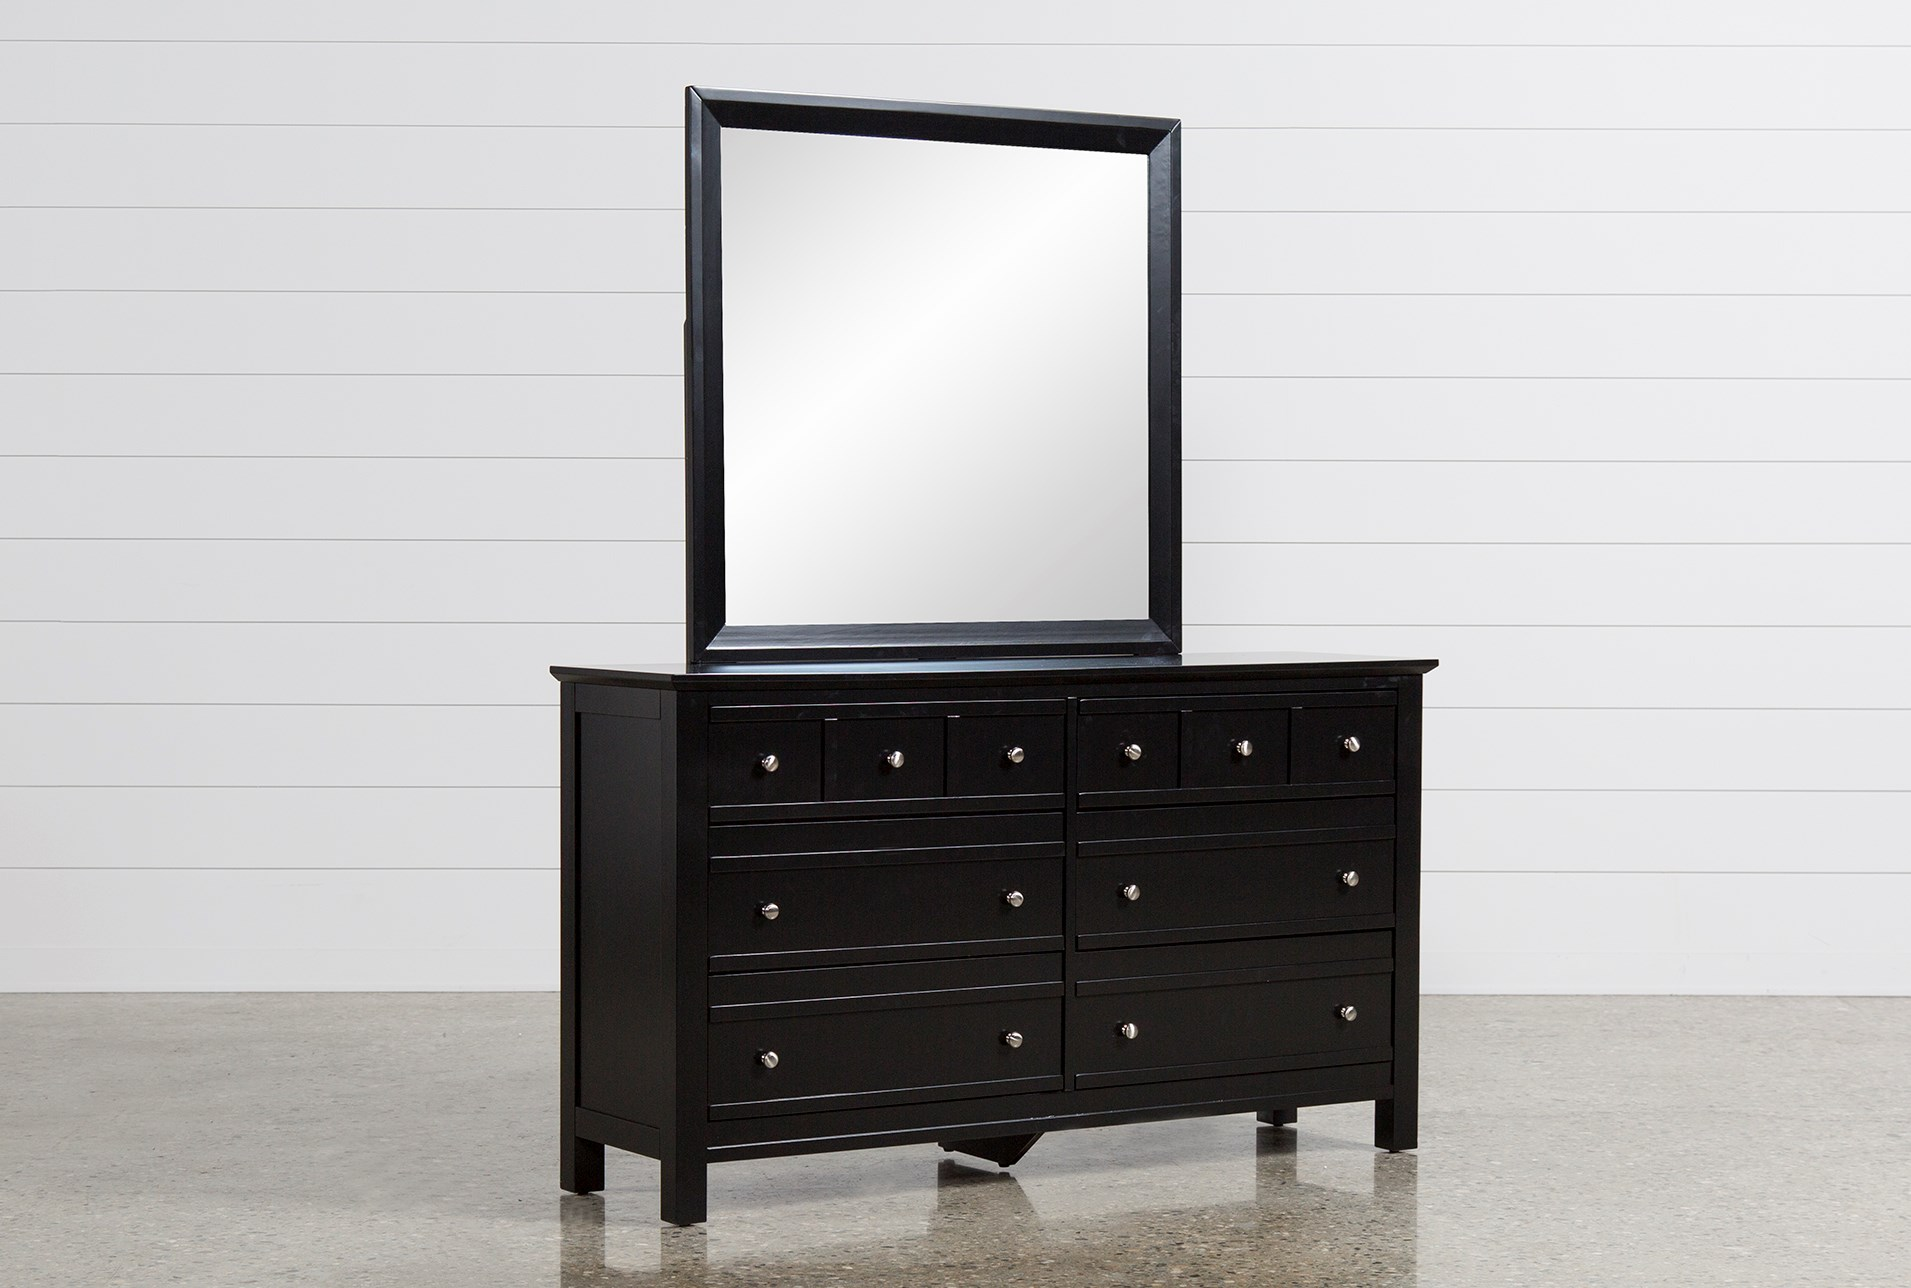 black dresser with mirror Bayside Black Dresser/Mirror | Living Spaces black dresser with mirror